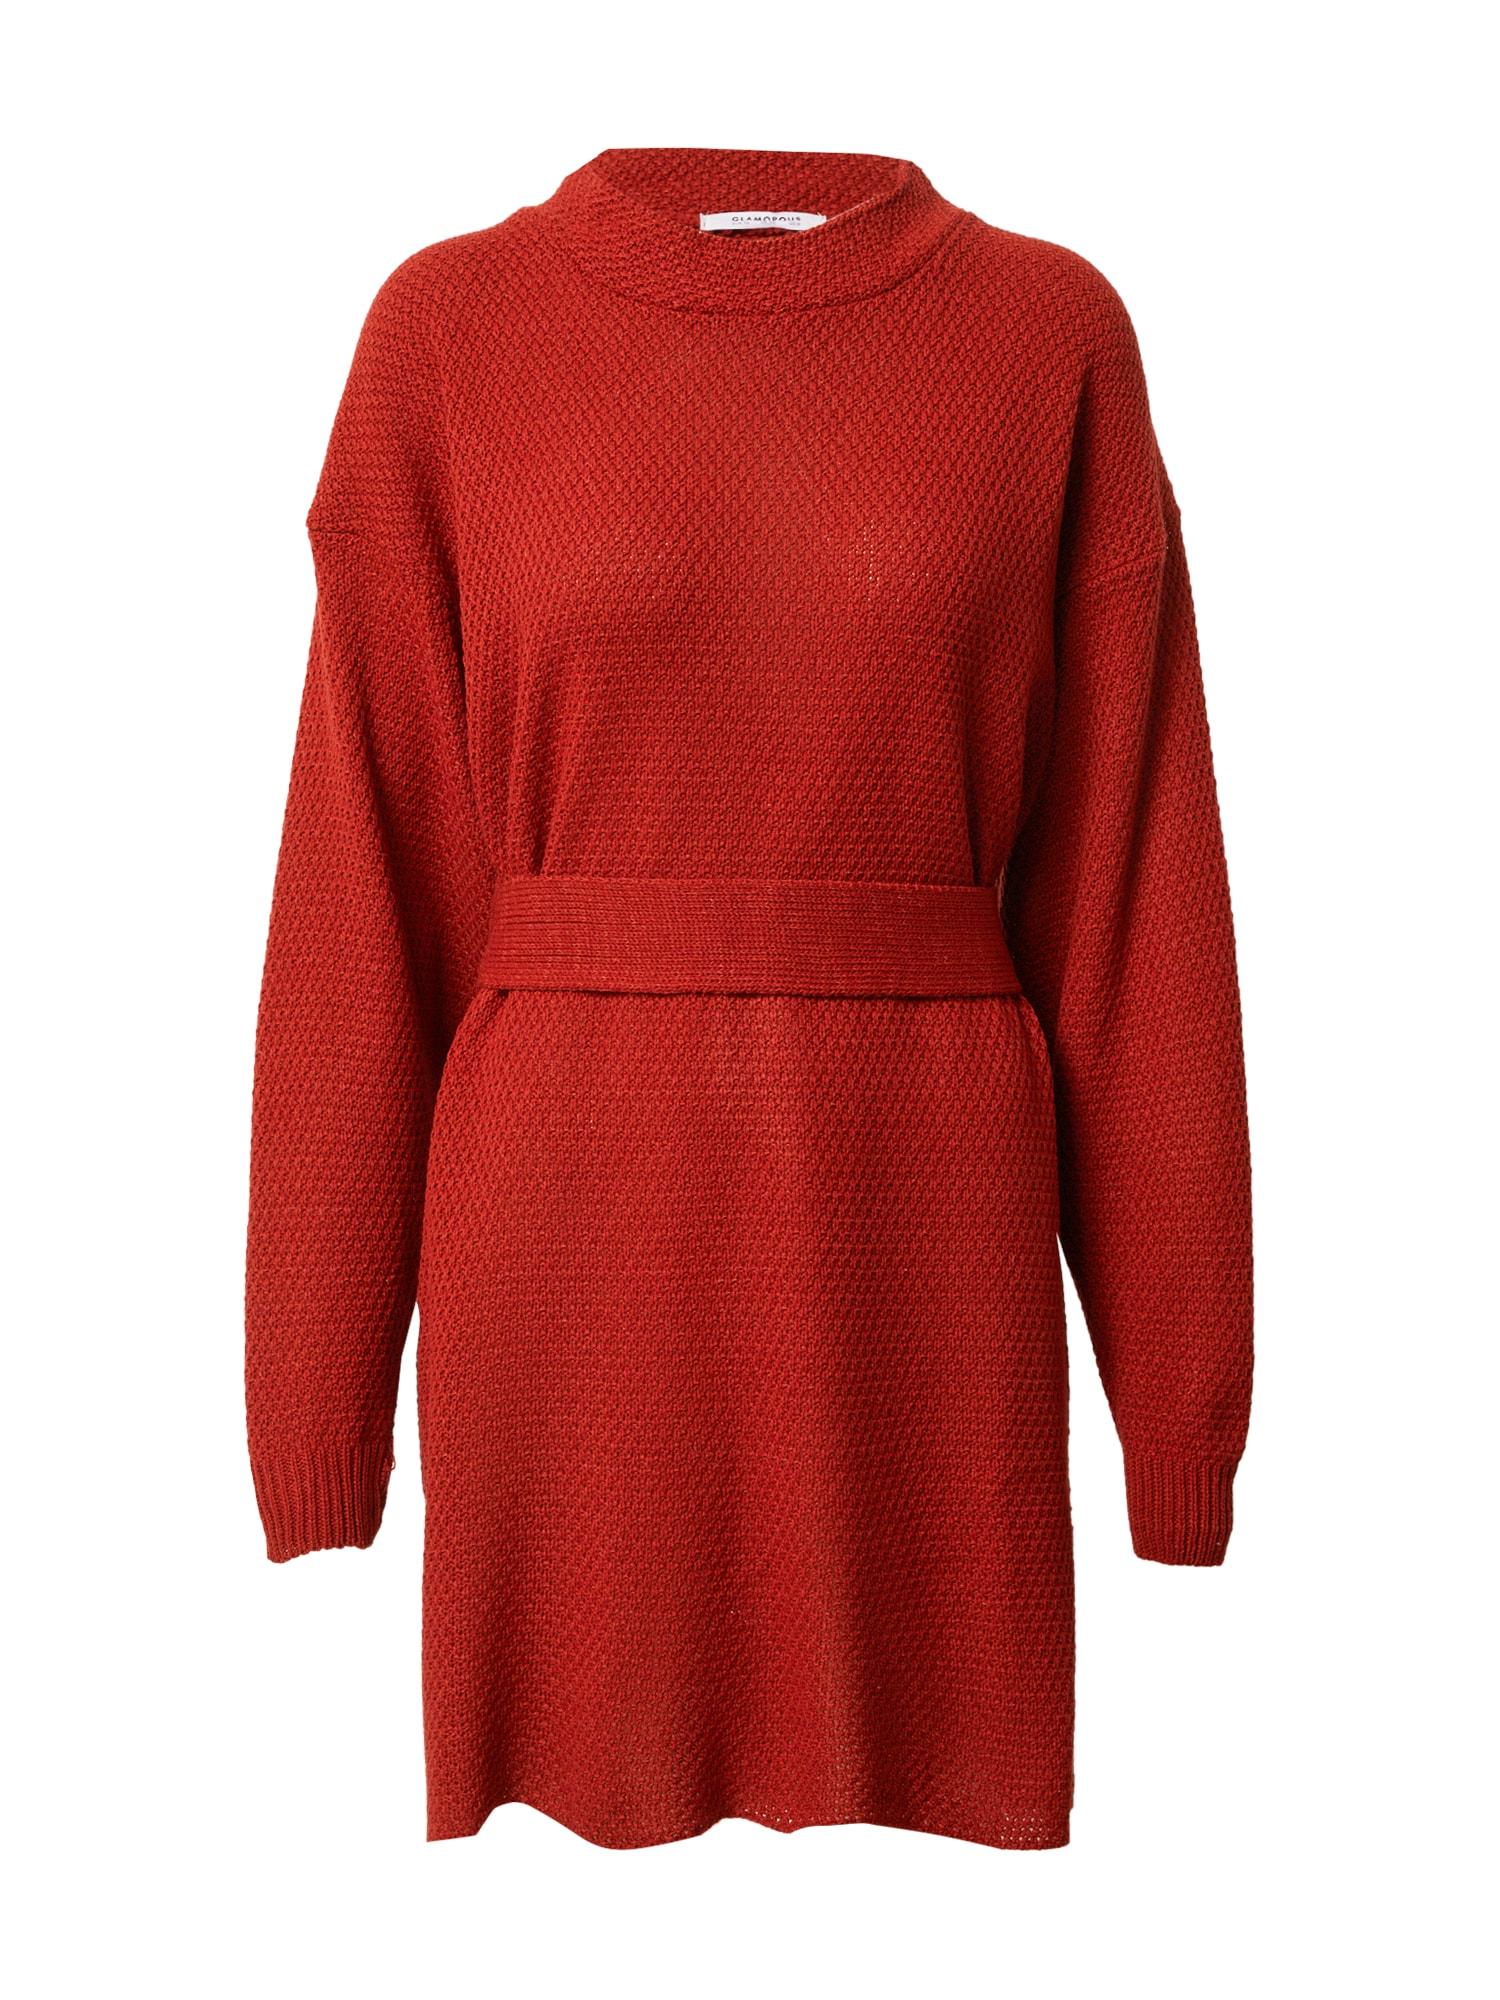 GLAMOROUS Megzta suknelė raudona